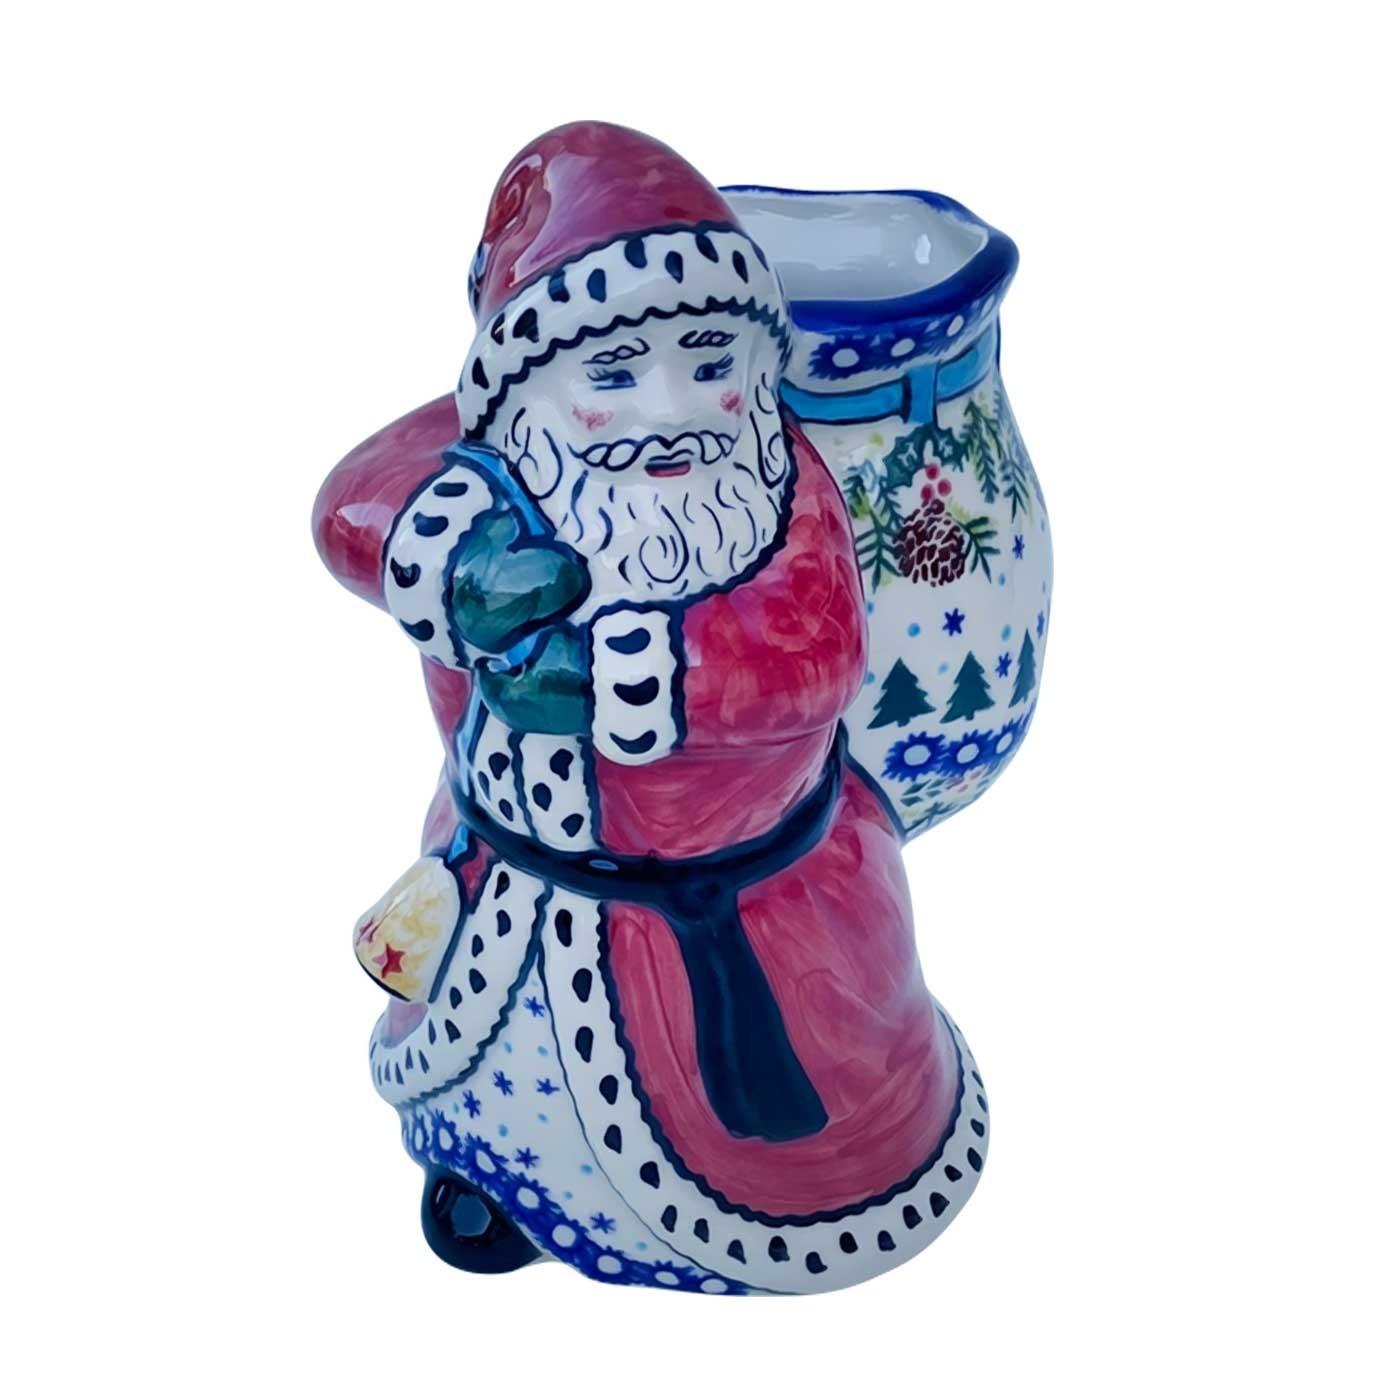 SANTA CLAUS W// Bag of TOYS LARGE PORCELAIN CHRISTMAS FIGURINE 8/'/'